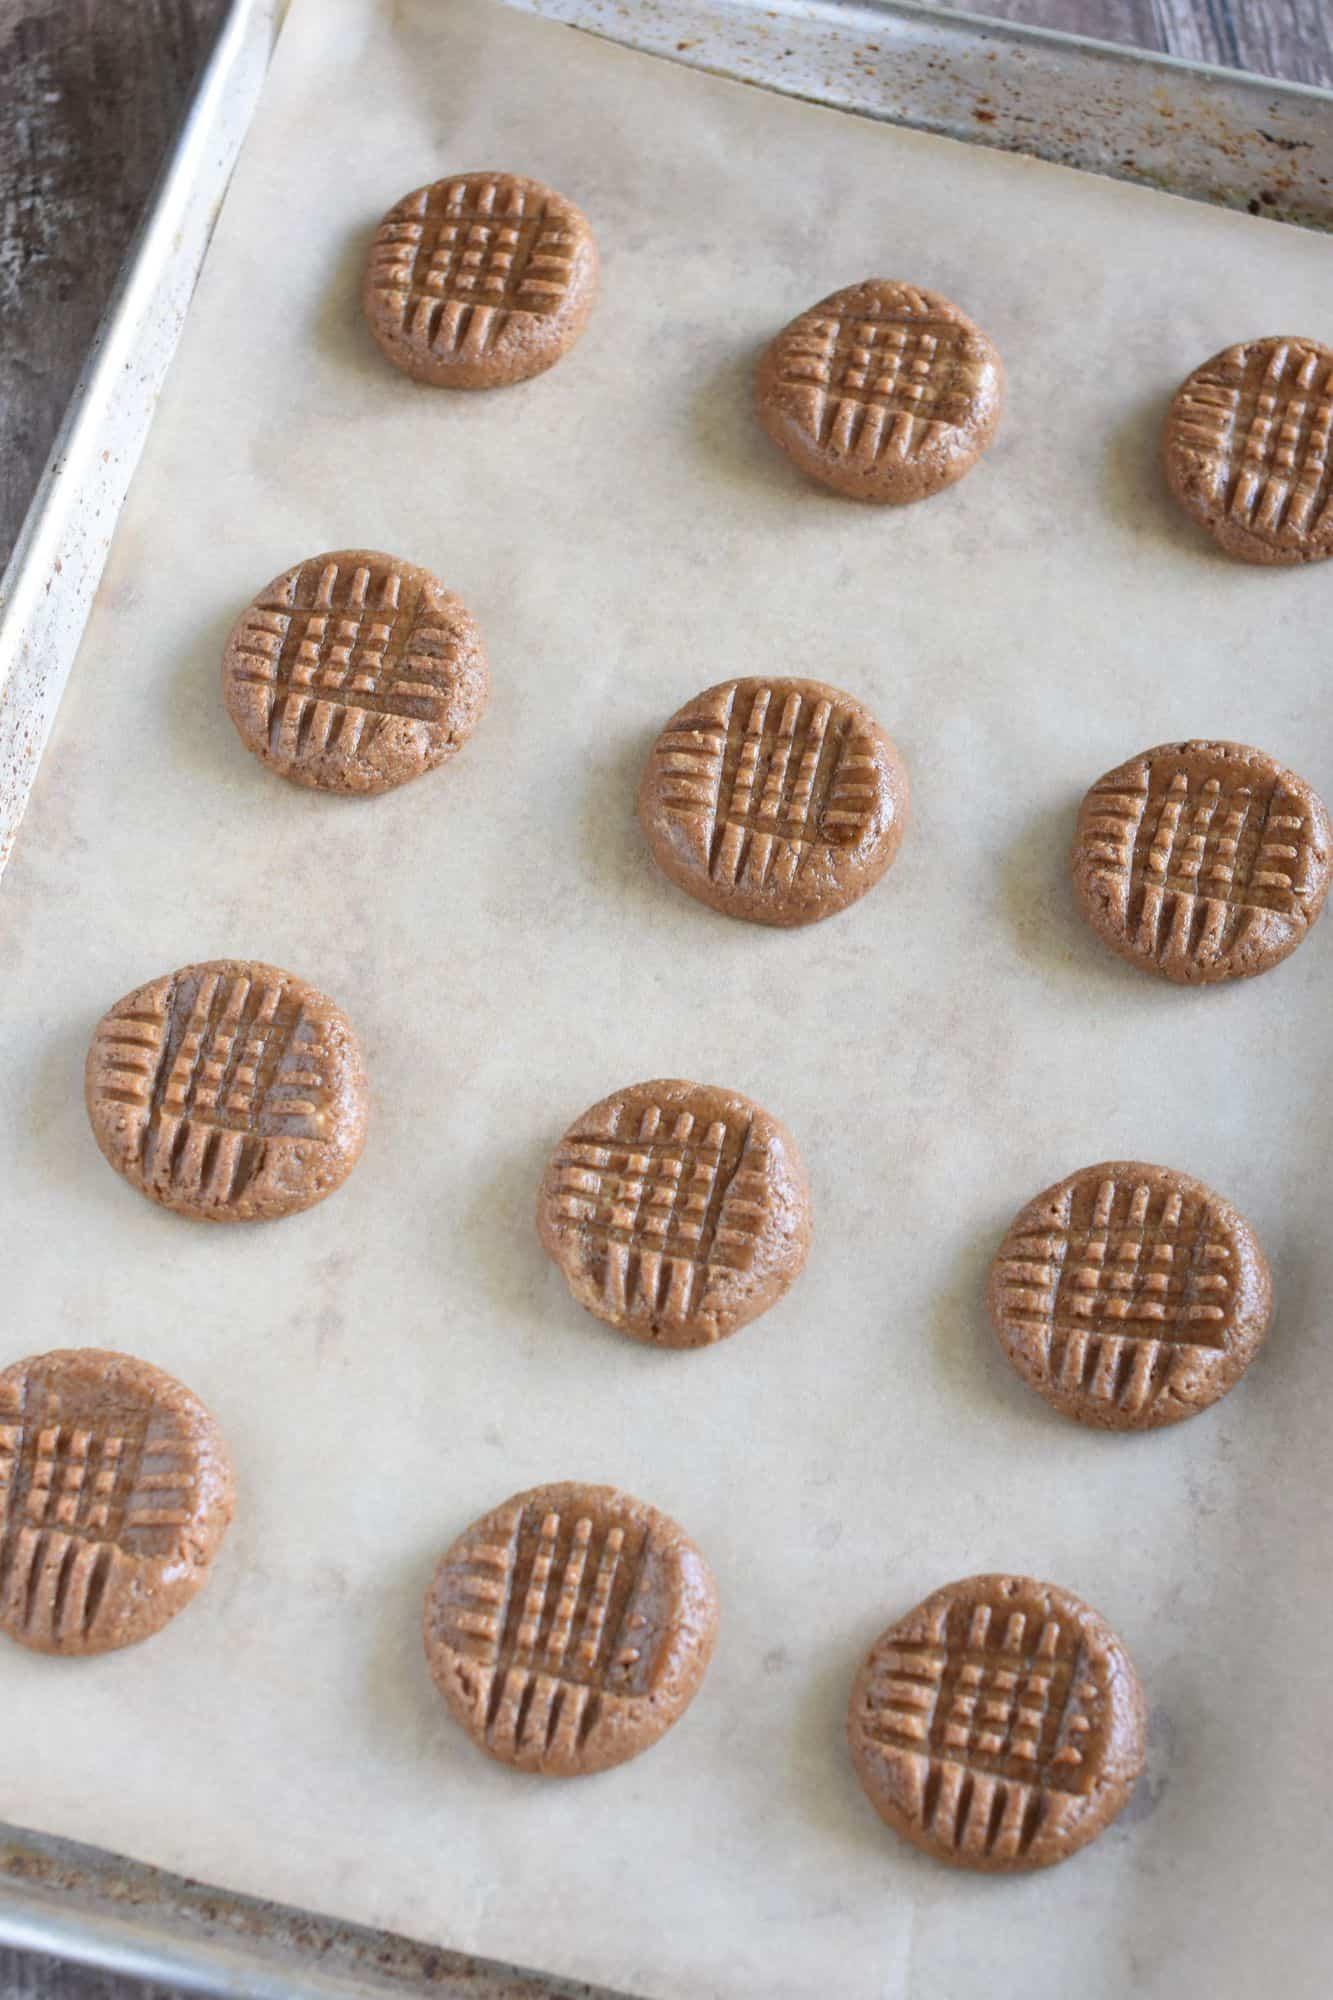 unbaked cookies on baking sheet